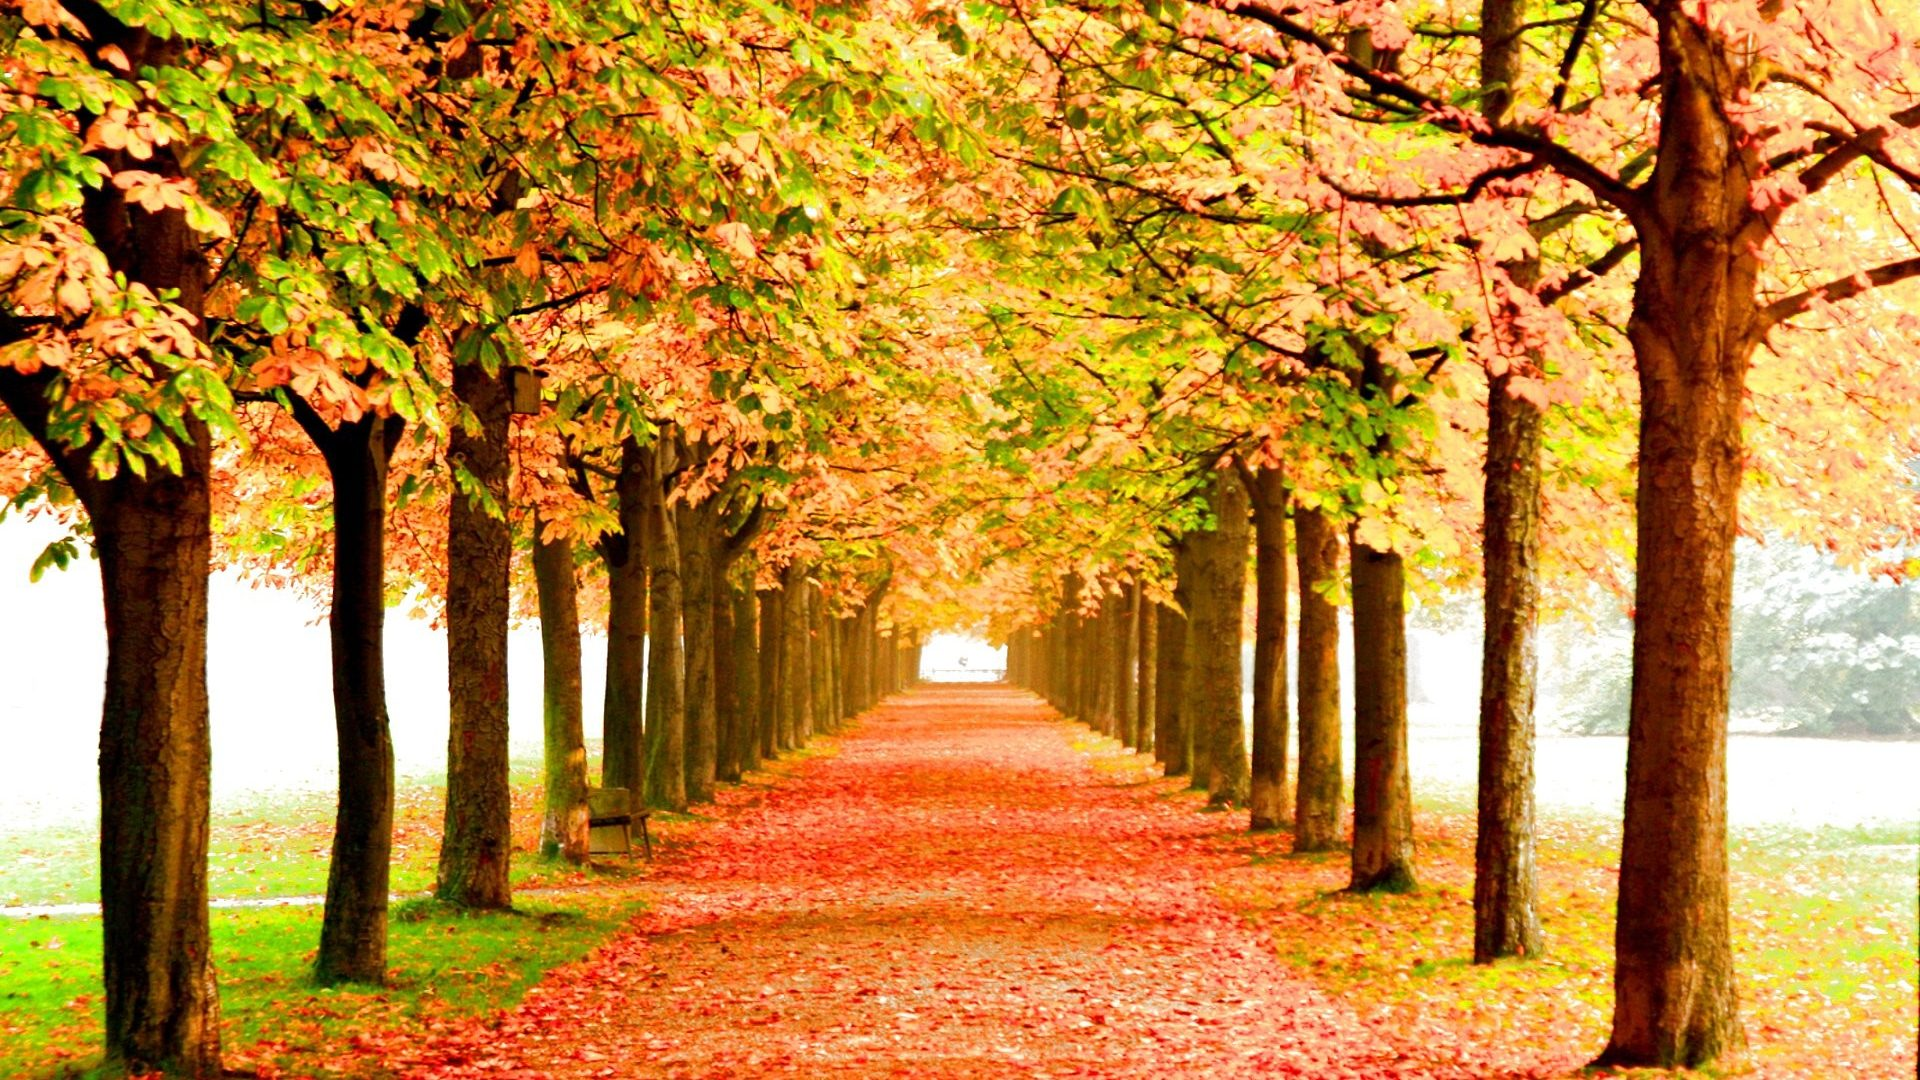 forest natural Fall Season Wallpaper